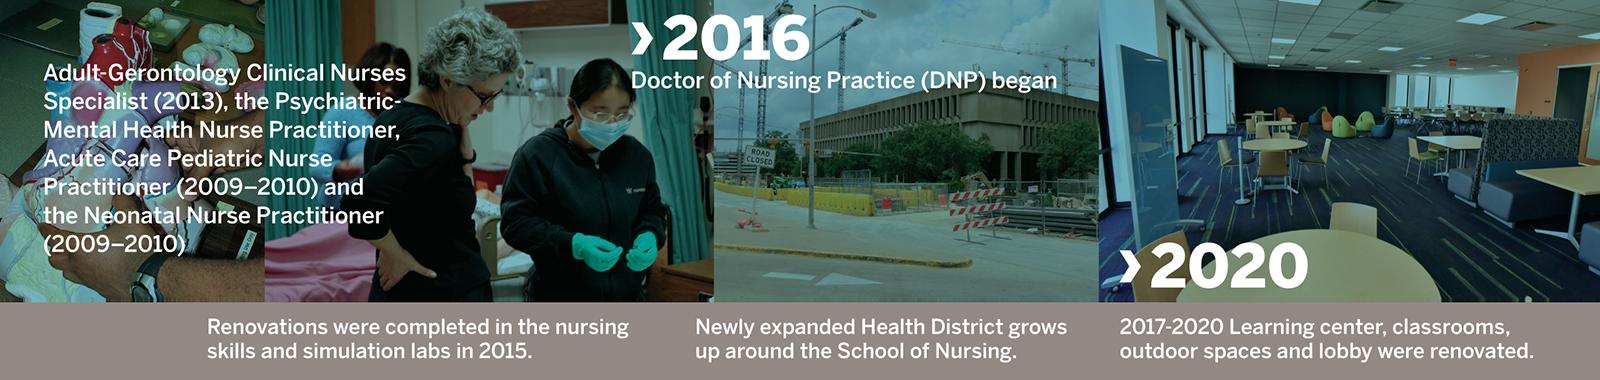 UT Austin School of Nursing Timeline